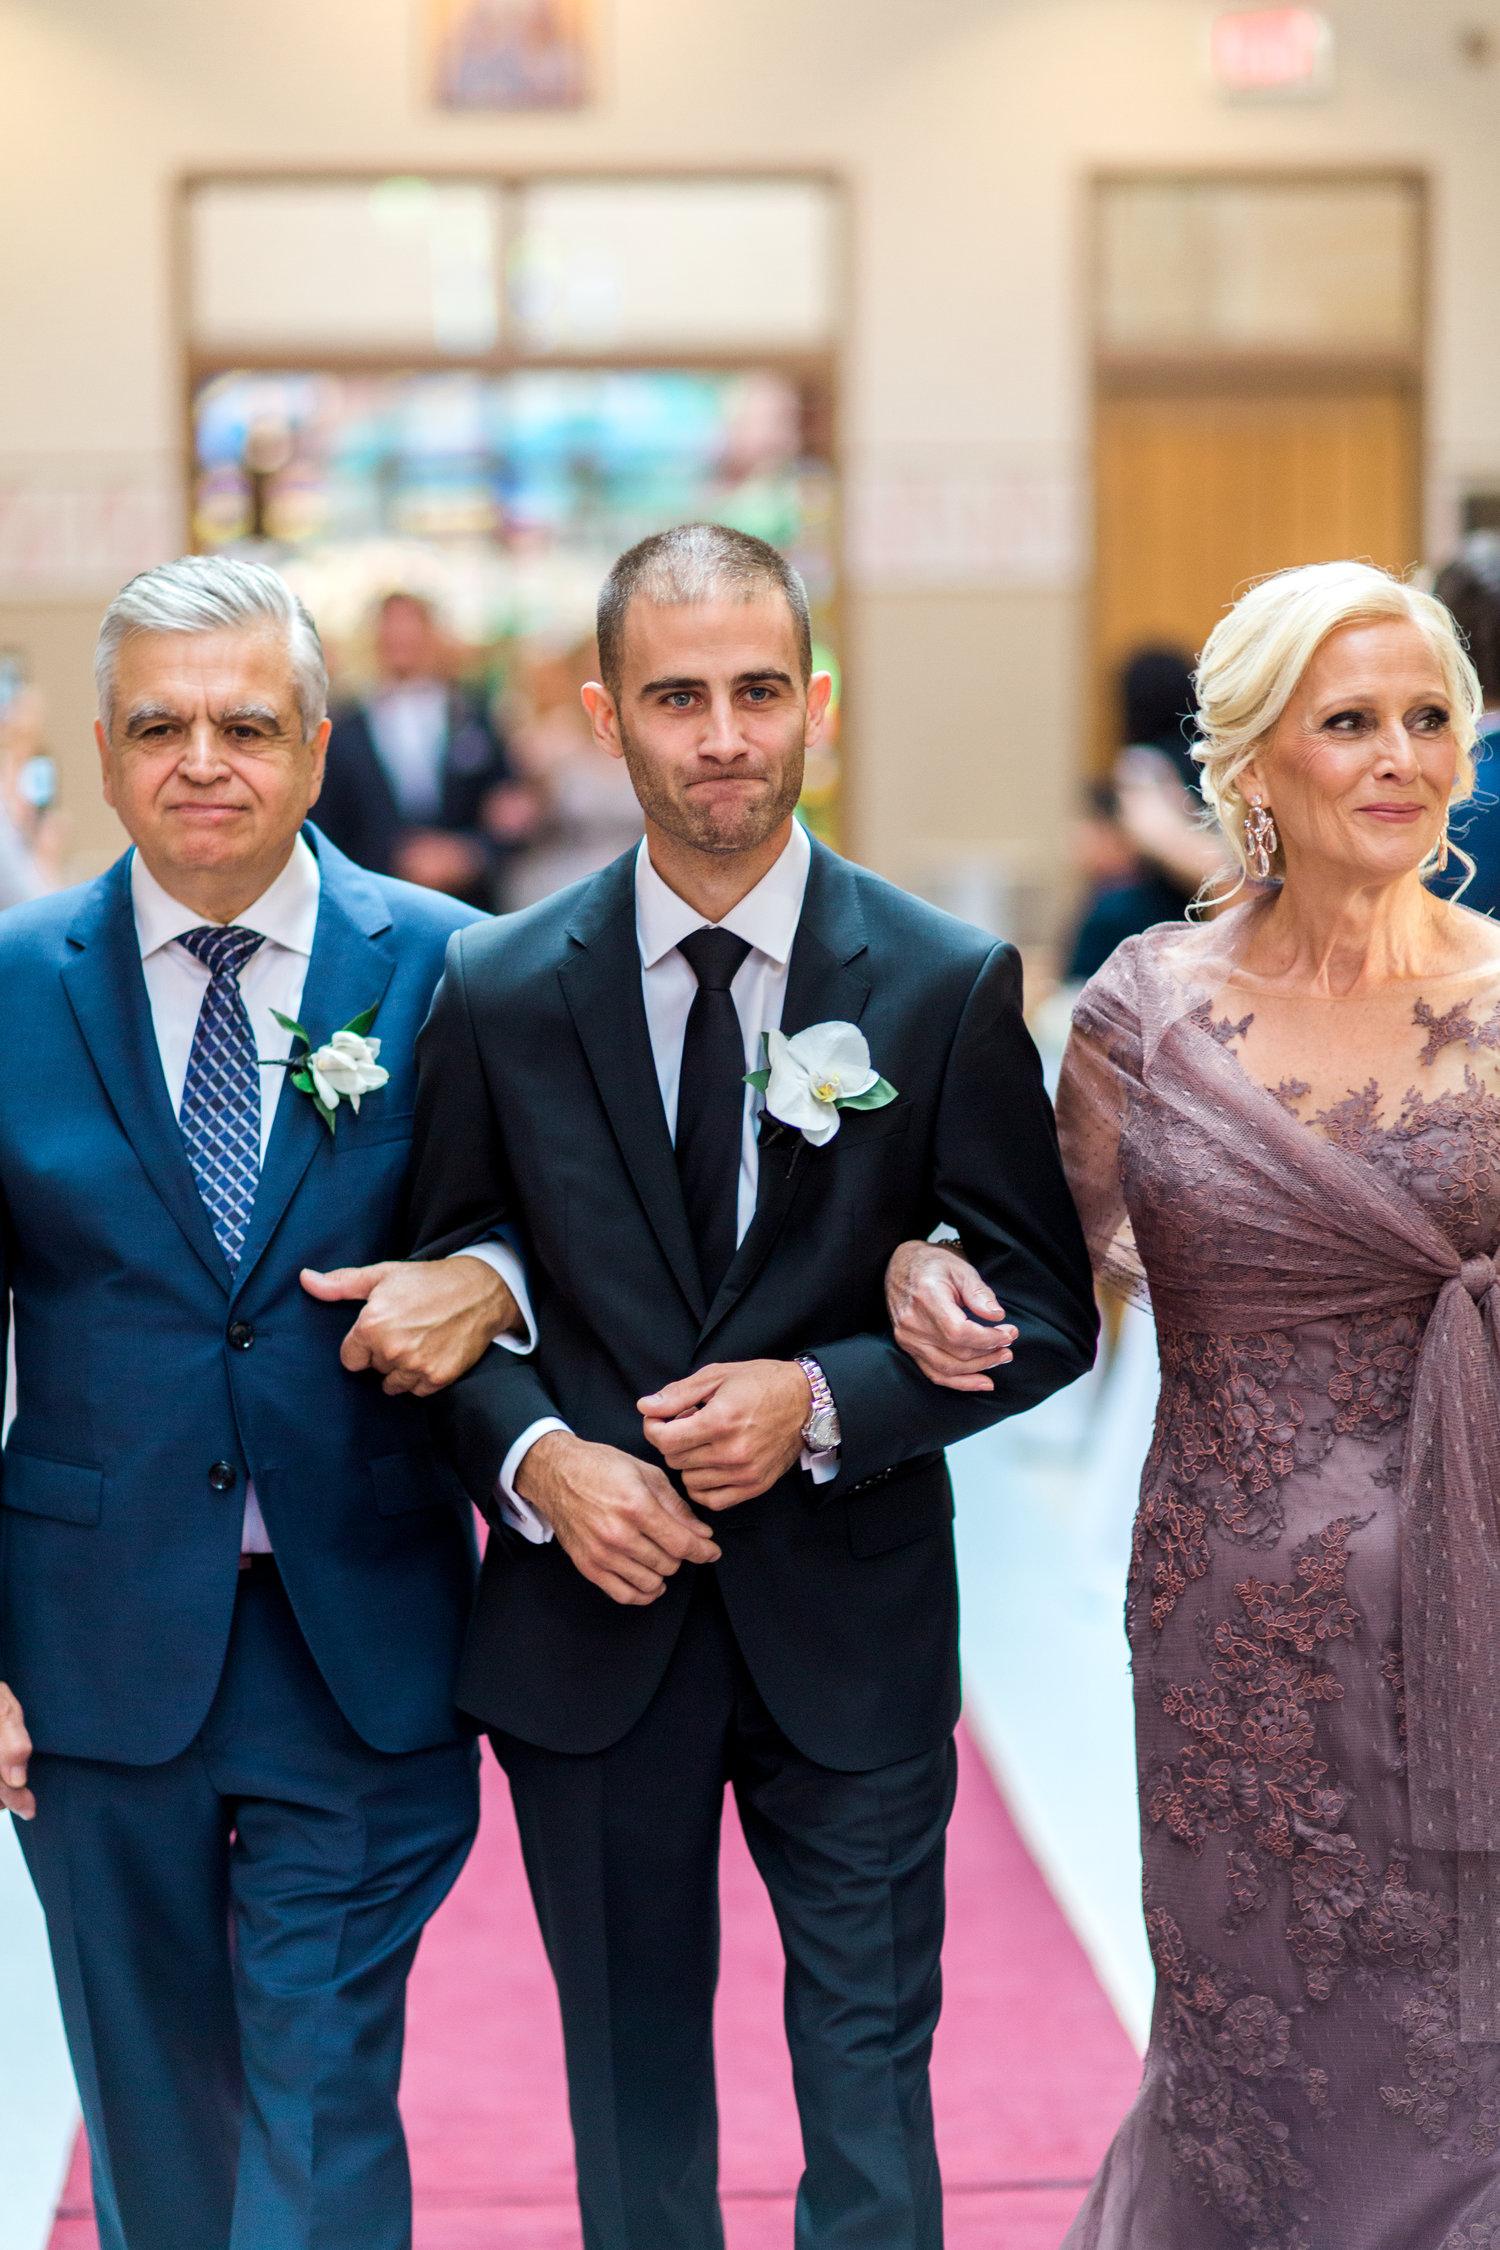 Danielle-Giroux-Amir-Golbazi-Toronto-Wedding-Photographer-Bellvue-Manor_DeLuca_1-290.jpg